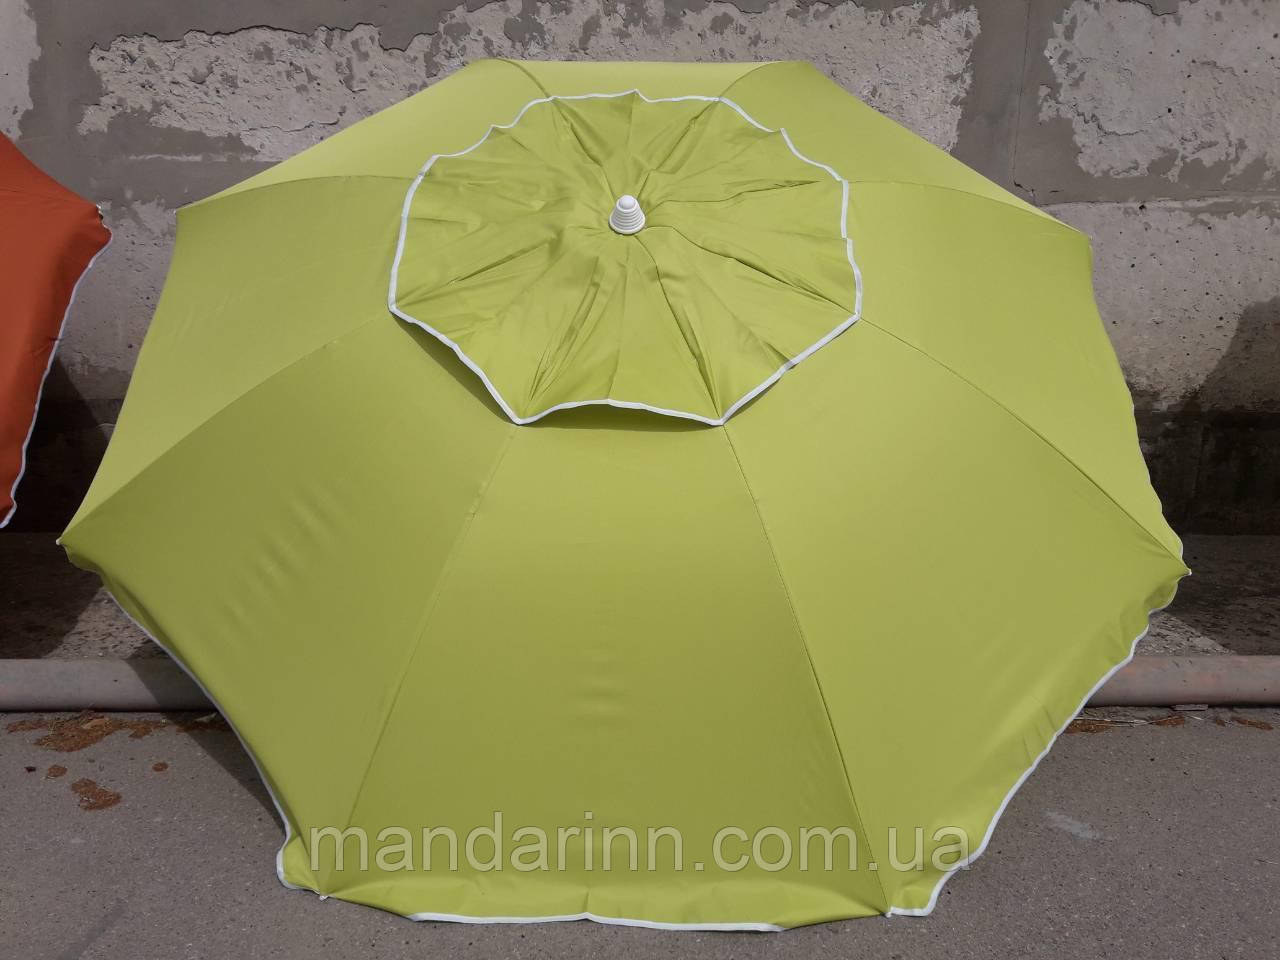 Пляжний зонт 1,8 м клапан нахил чохол червоний - фото 6